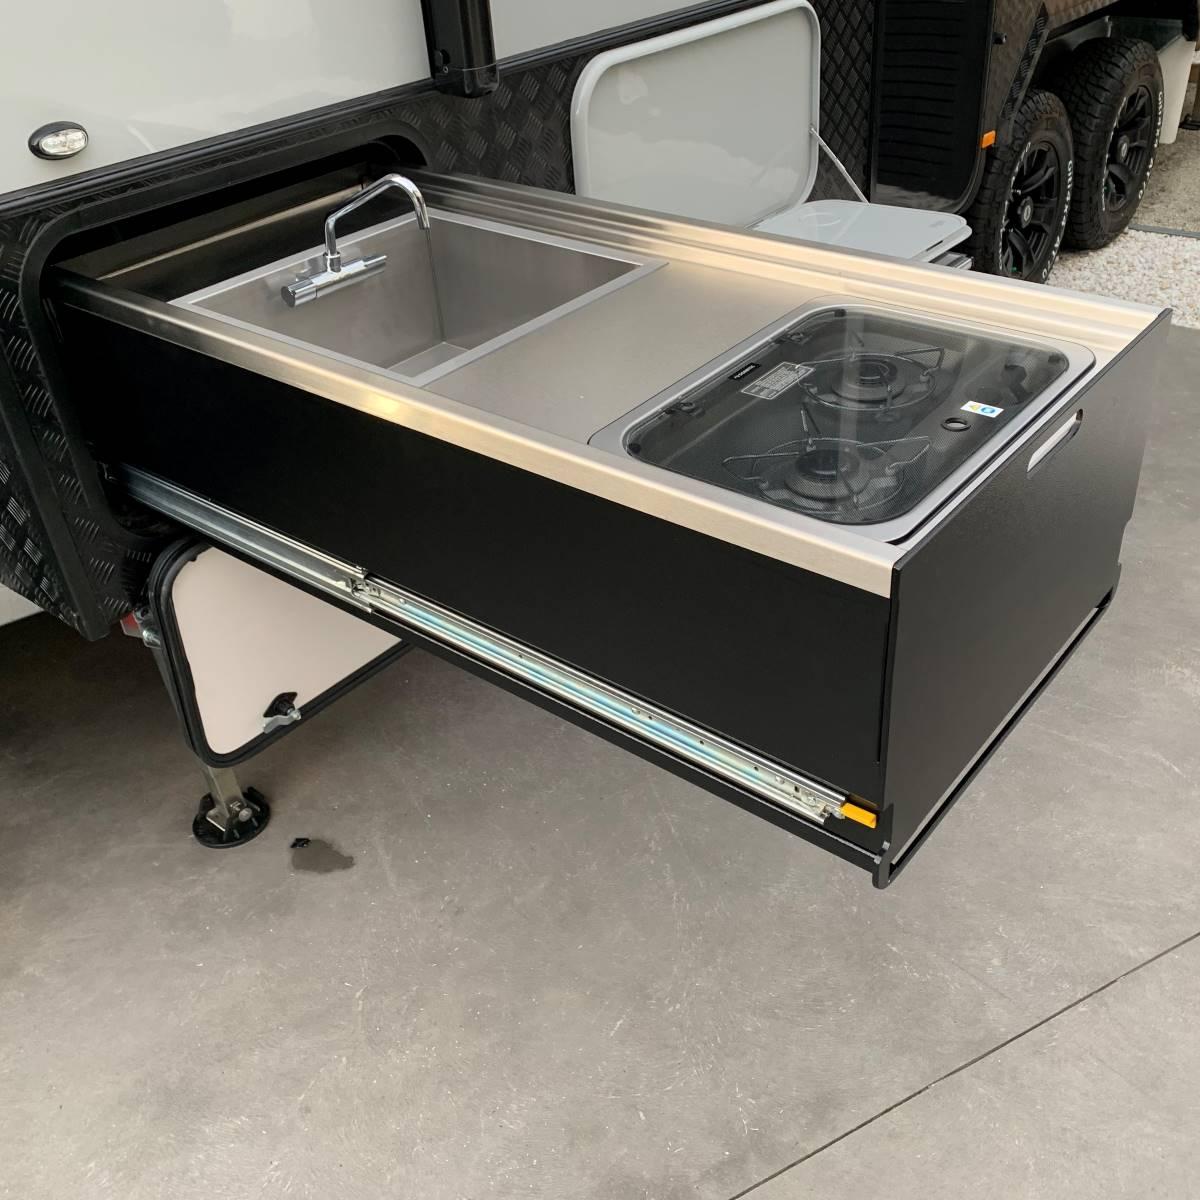 metal cooktop and sink